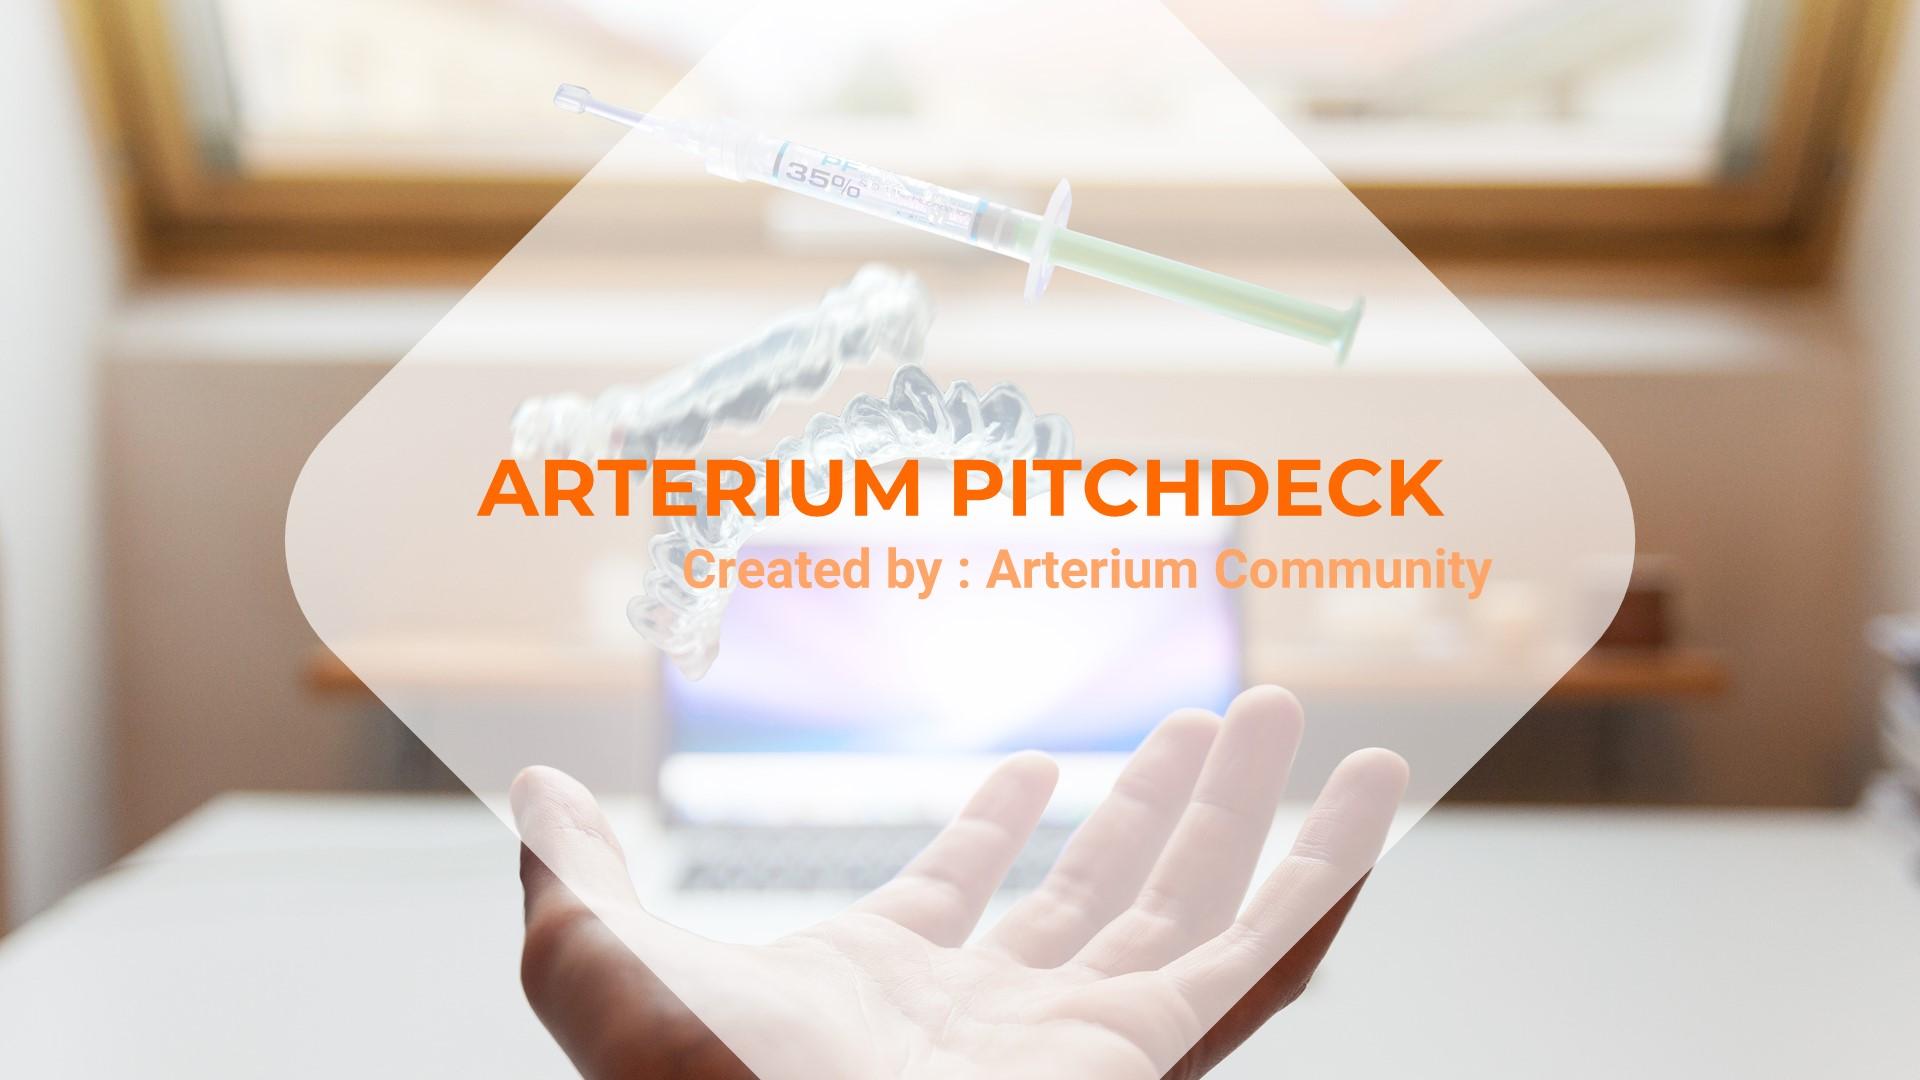 Arterium - Creative Medic Template PowerPoint №87430